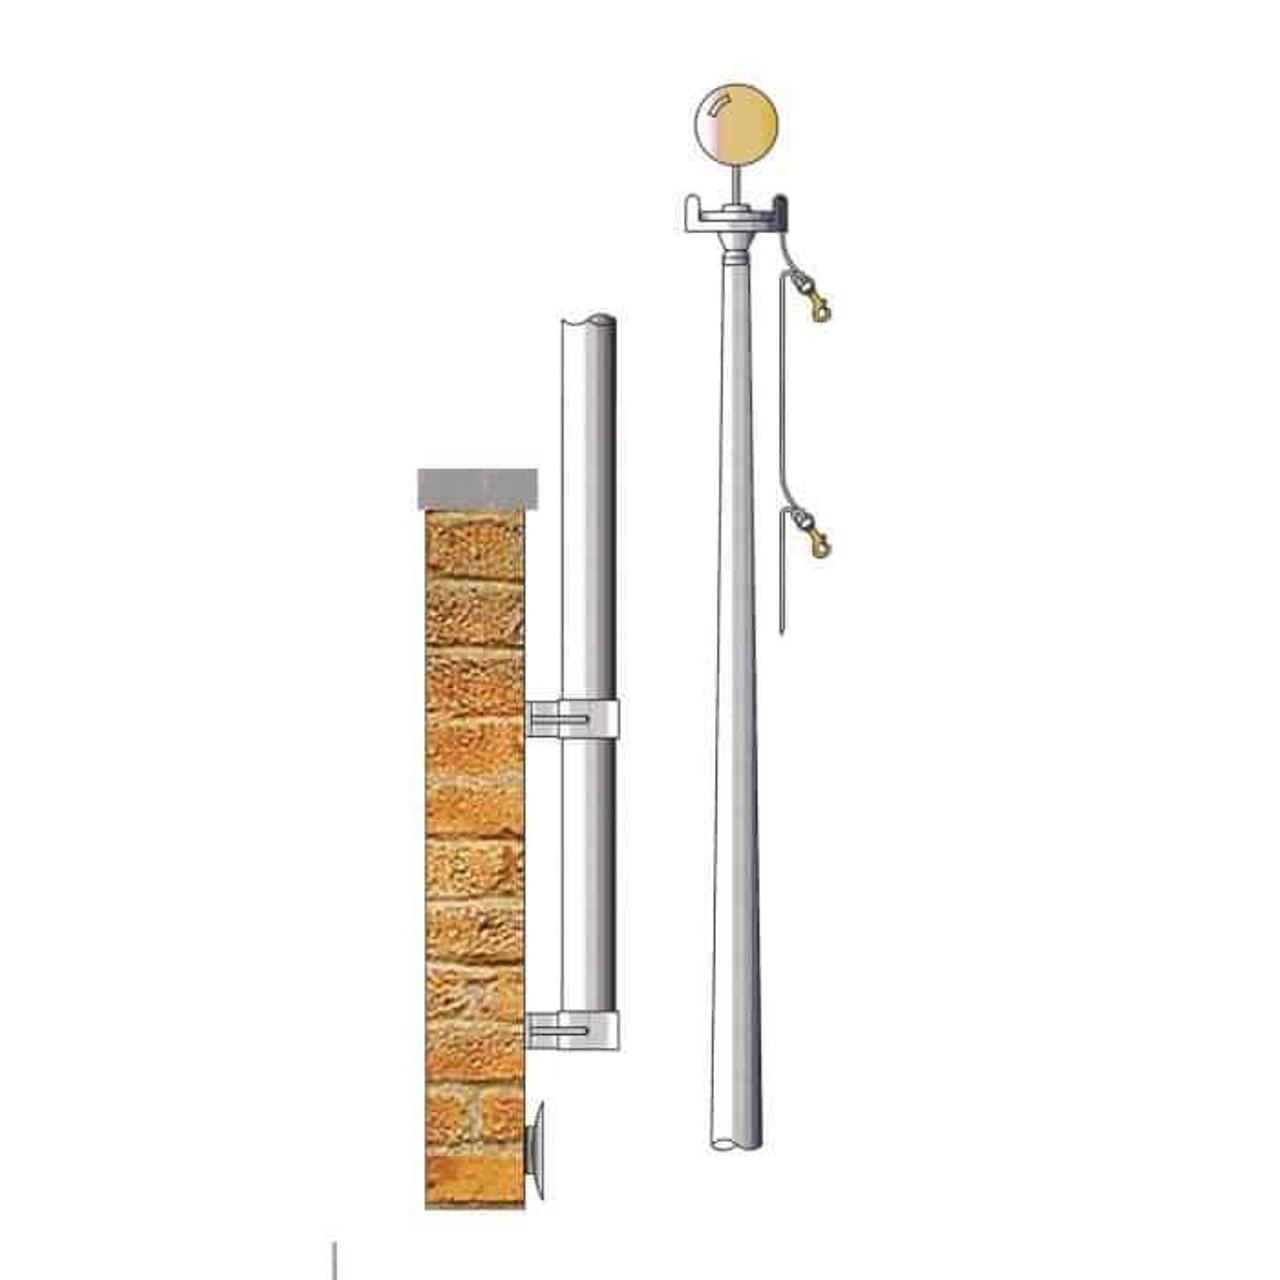 27 Vertical Wall Mounted Flagpole EVWAF27